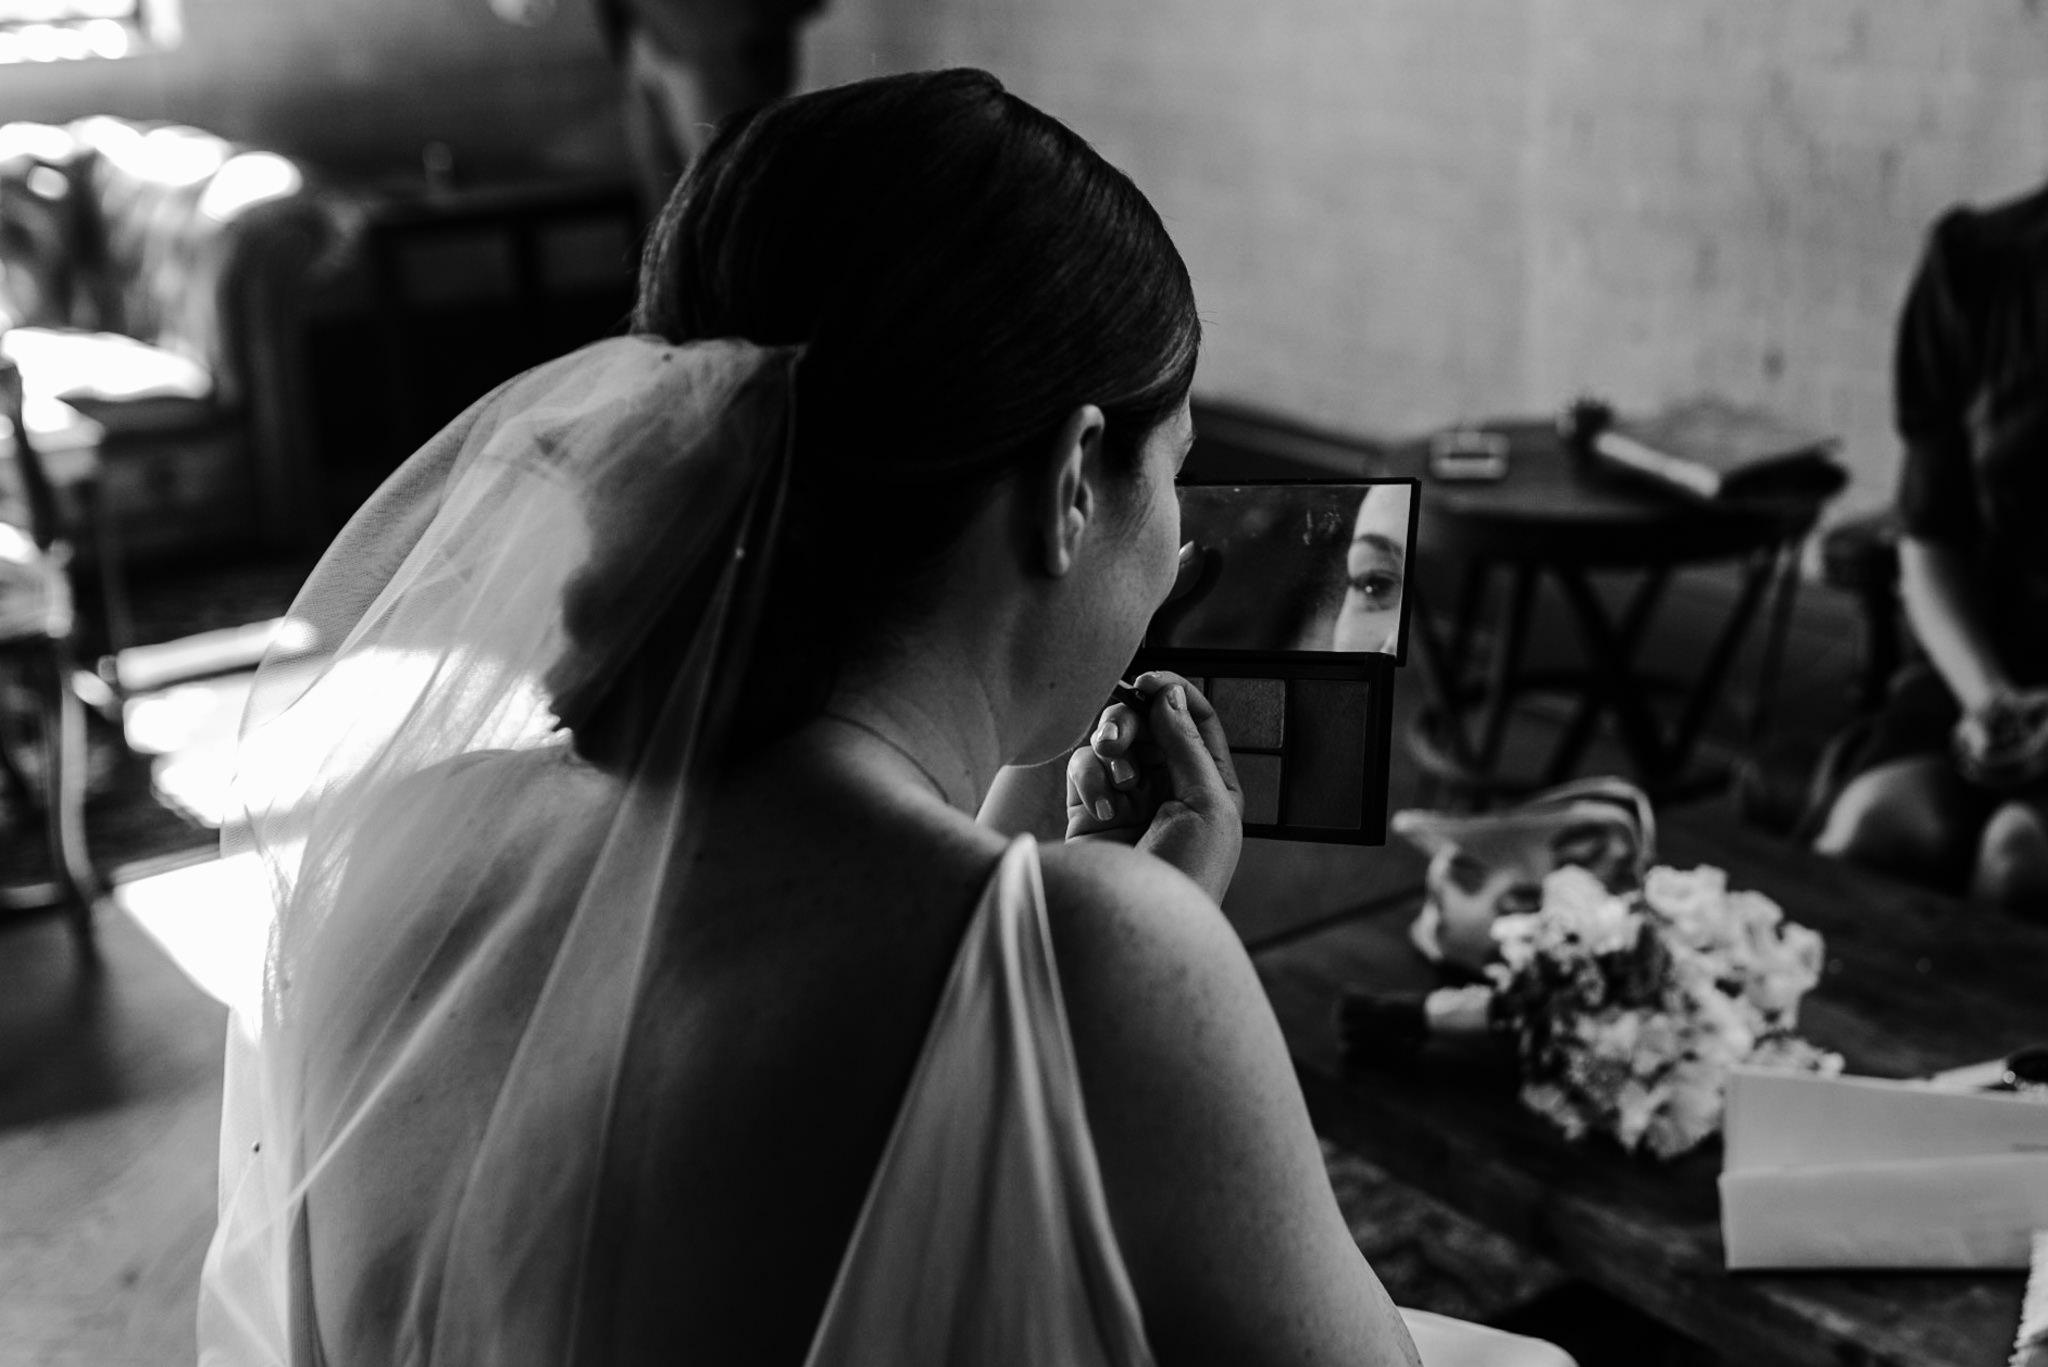 115-bride-getting-ready-storys-building-documentary-wedding-photographer.jpg